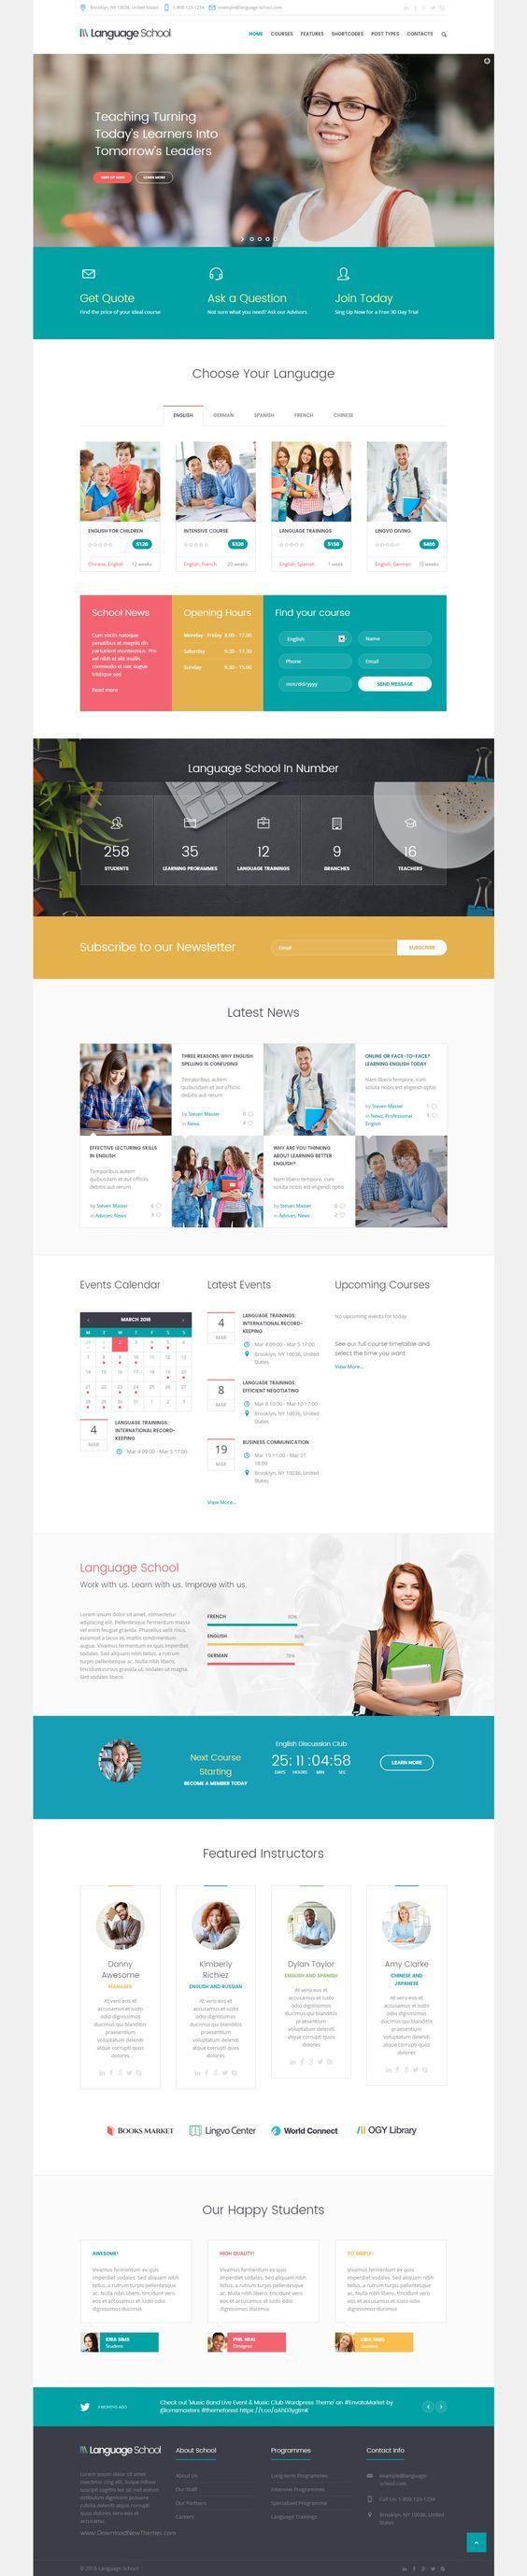 WordPress - Online Courses, Classes, Training, Tutorials ...